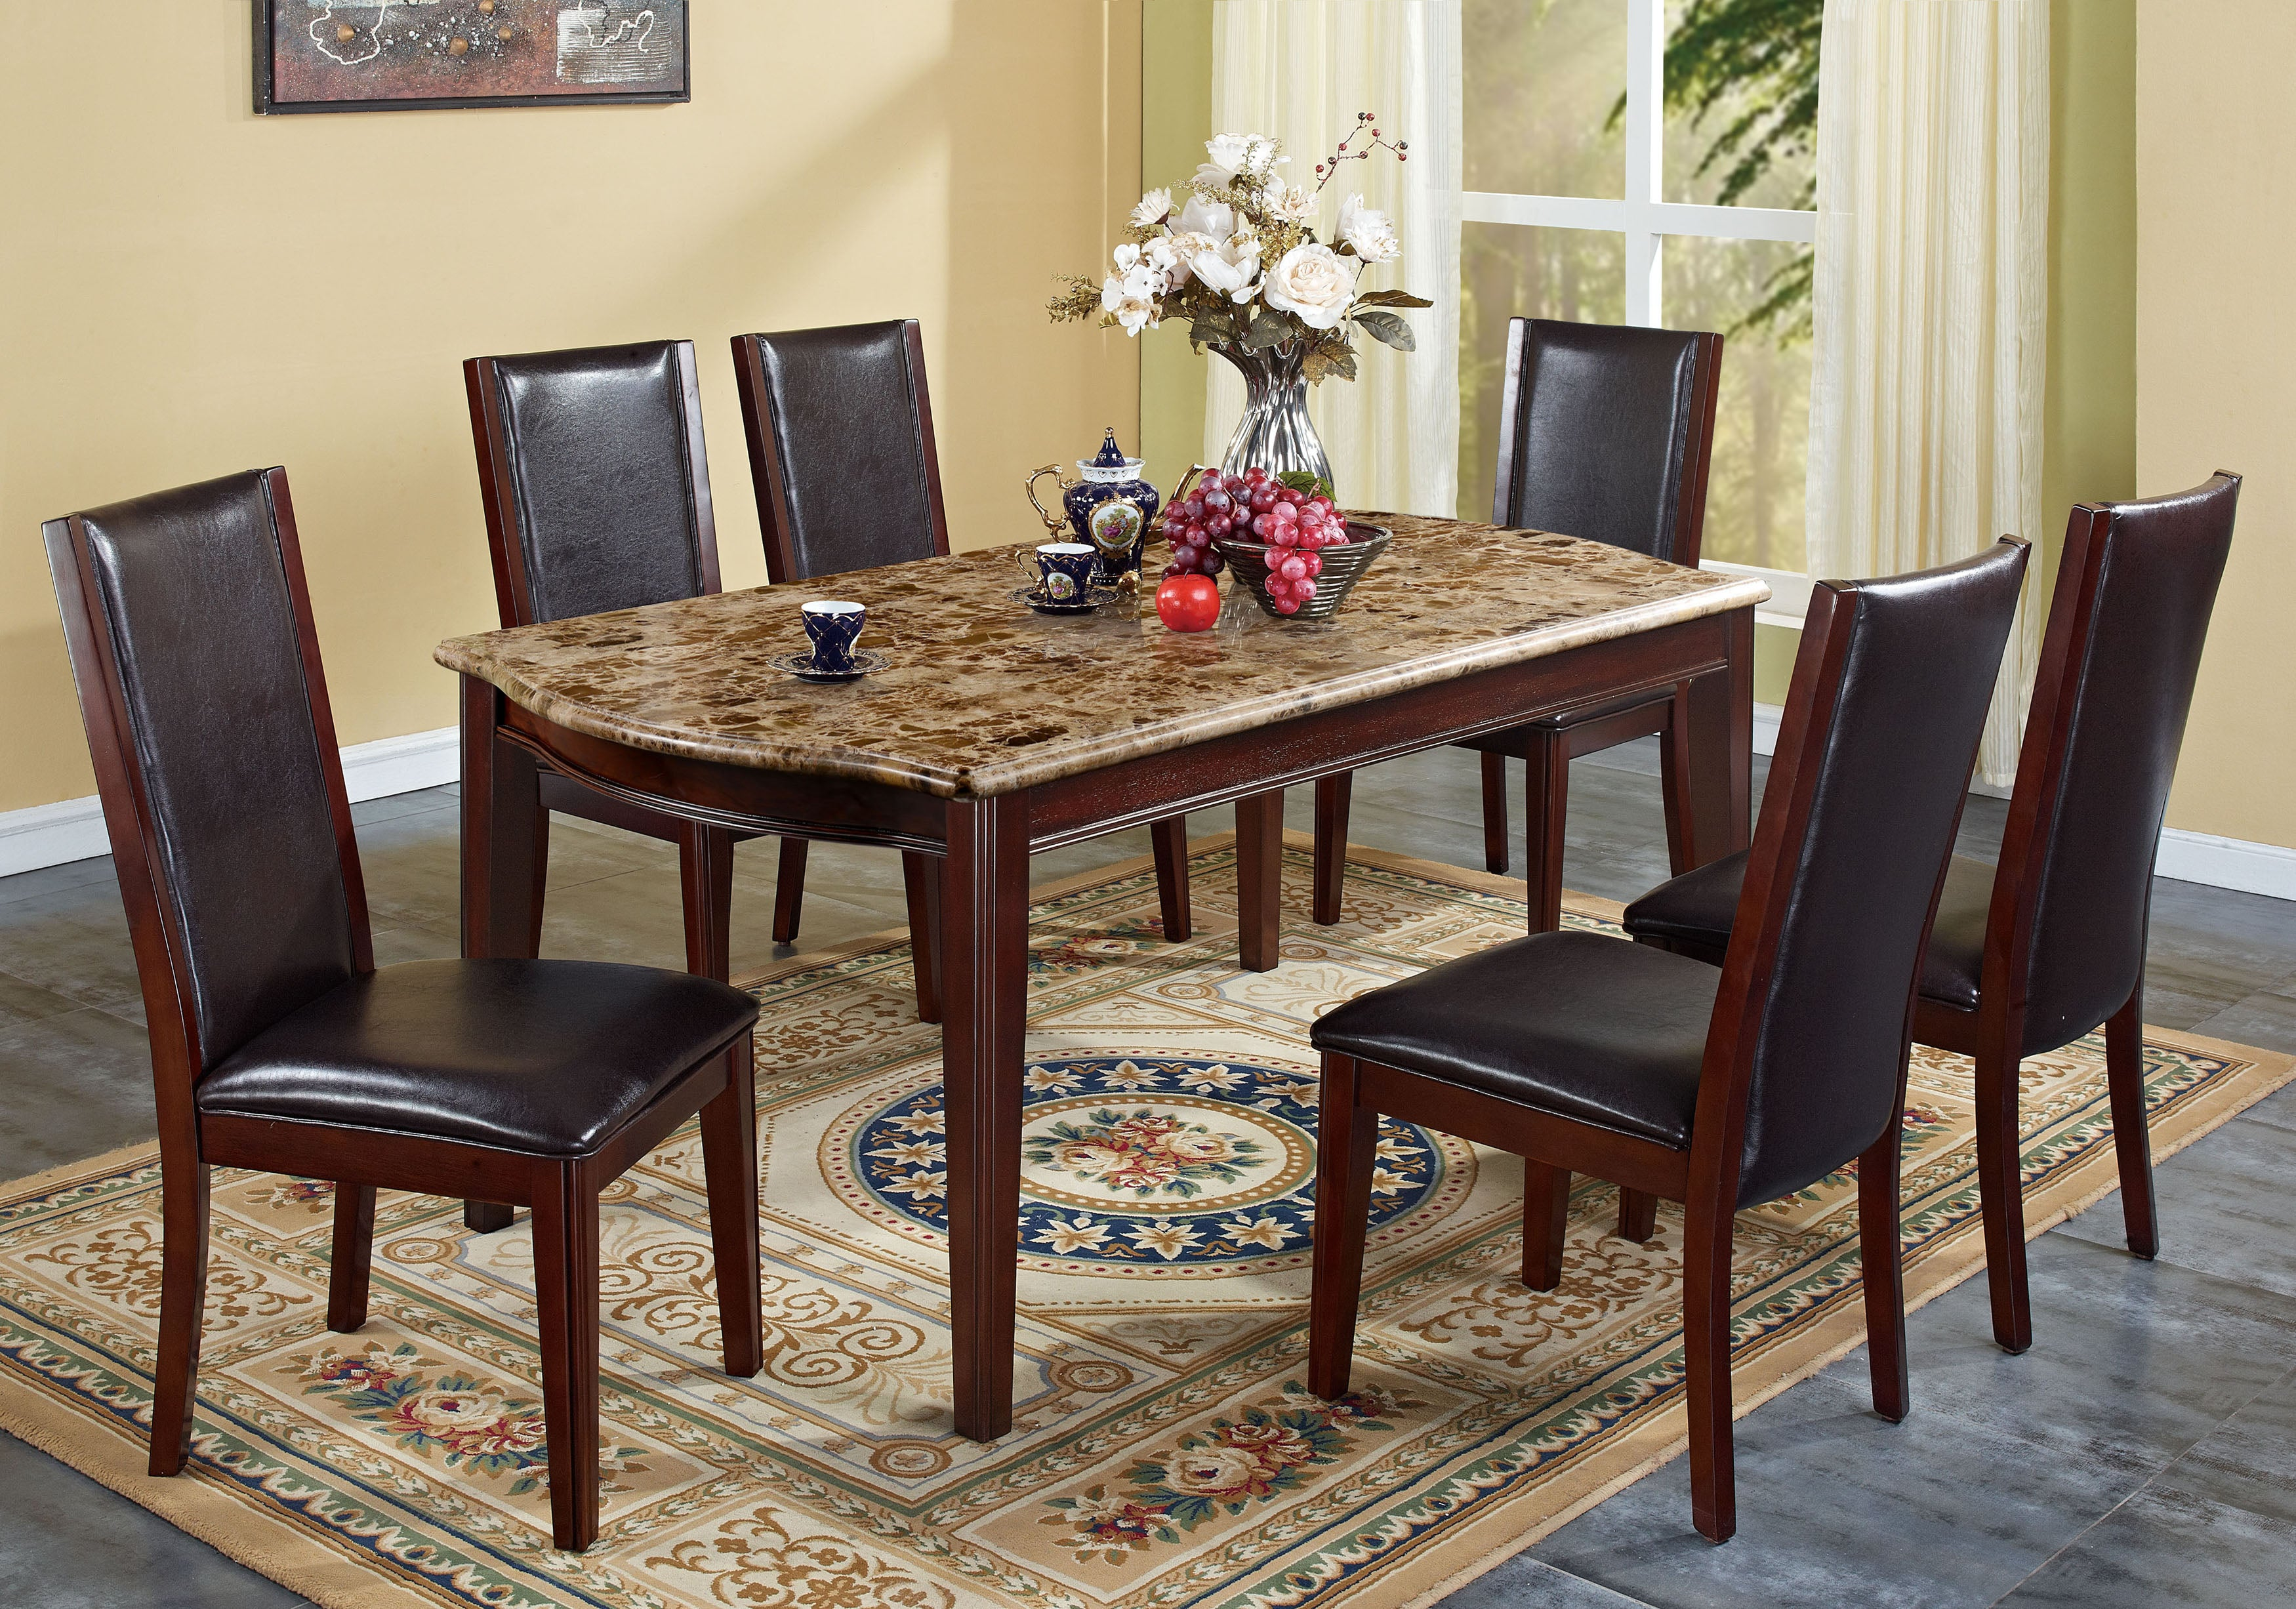 Radian Emperor Dark Real Marble Top 7-piece Dining Set